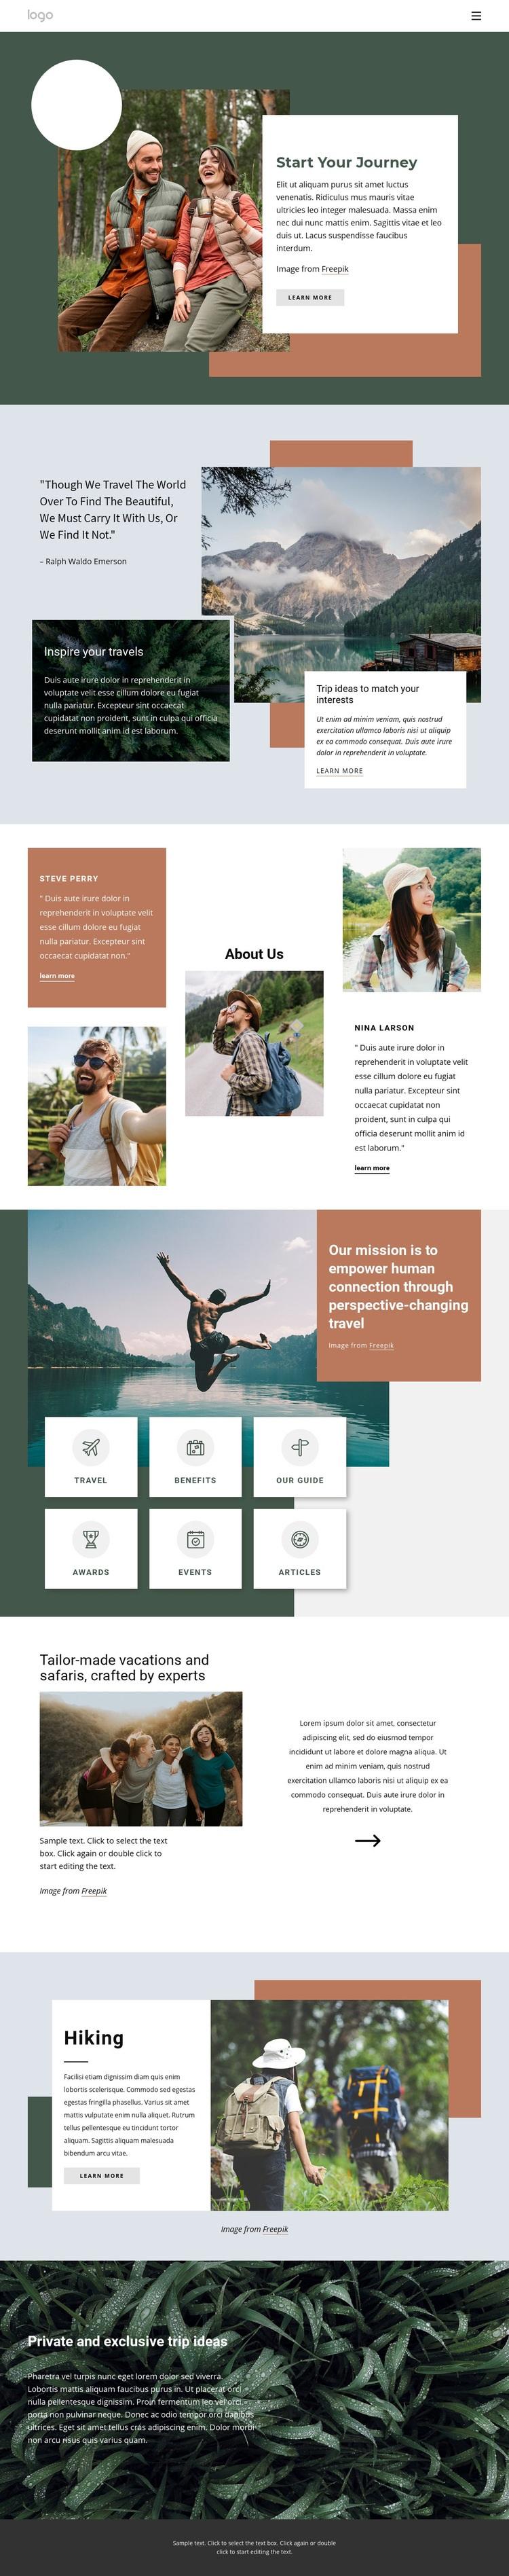 Adventure travel company Html Code Example